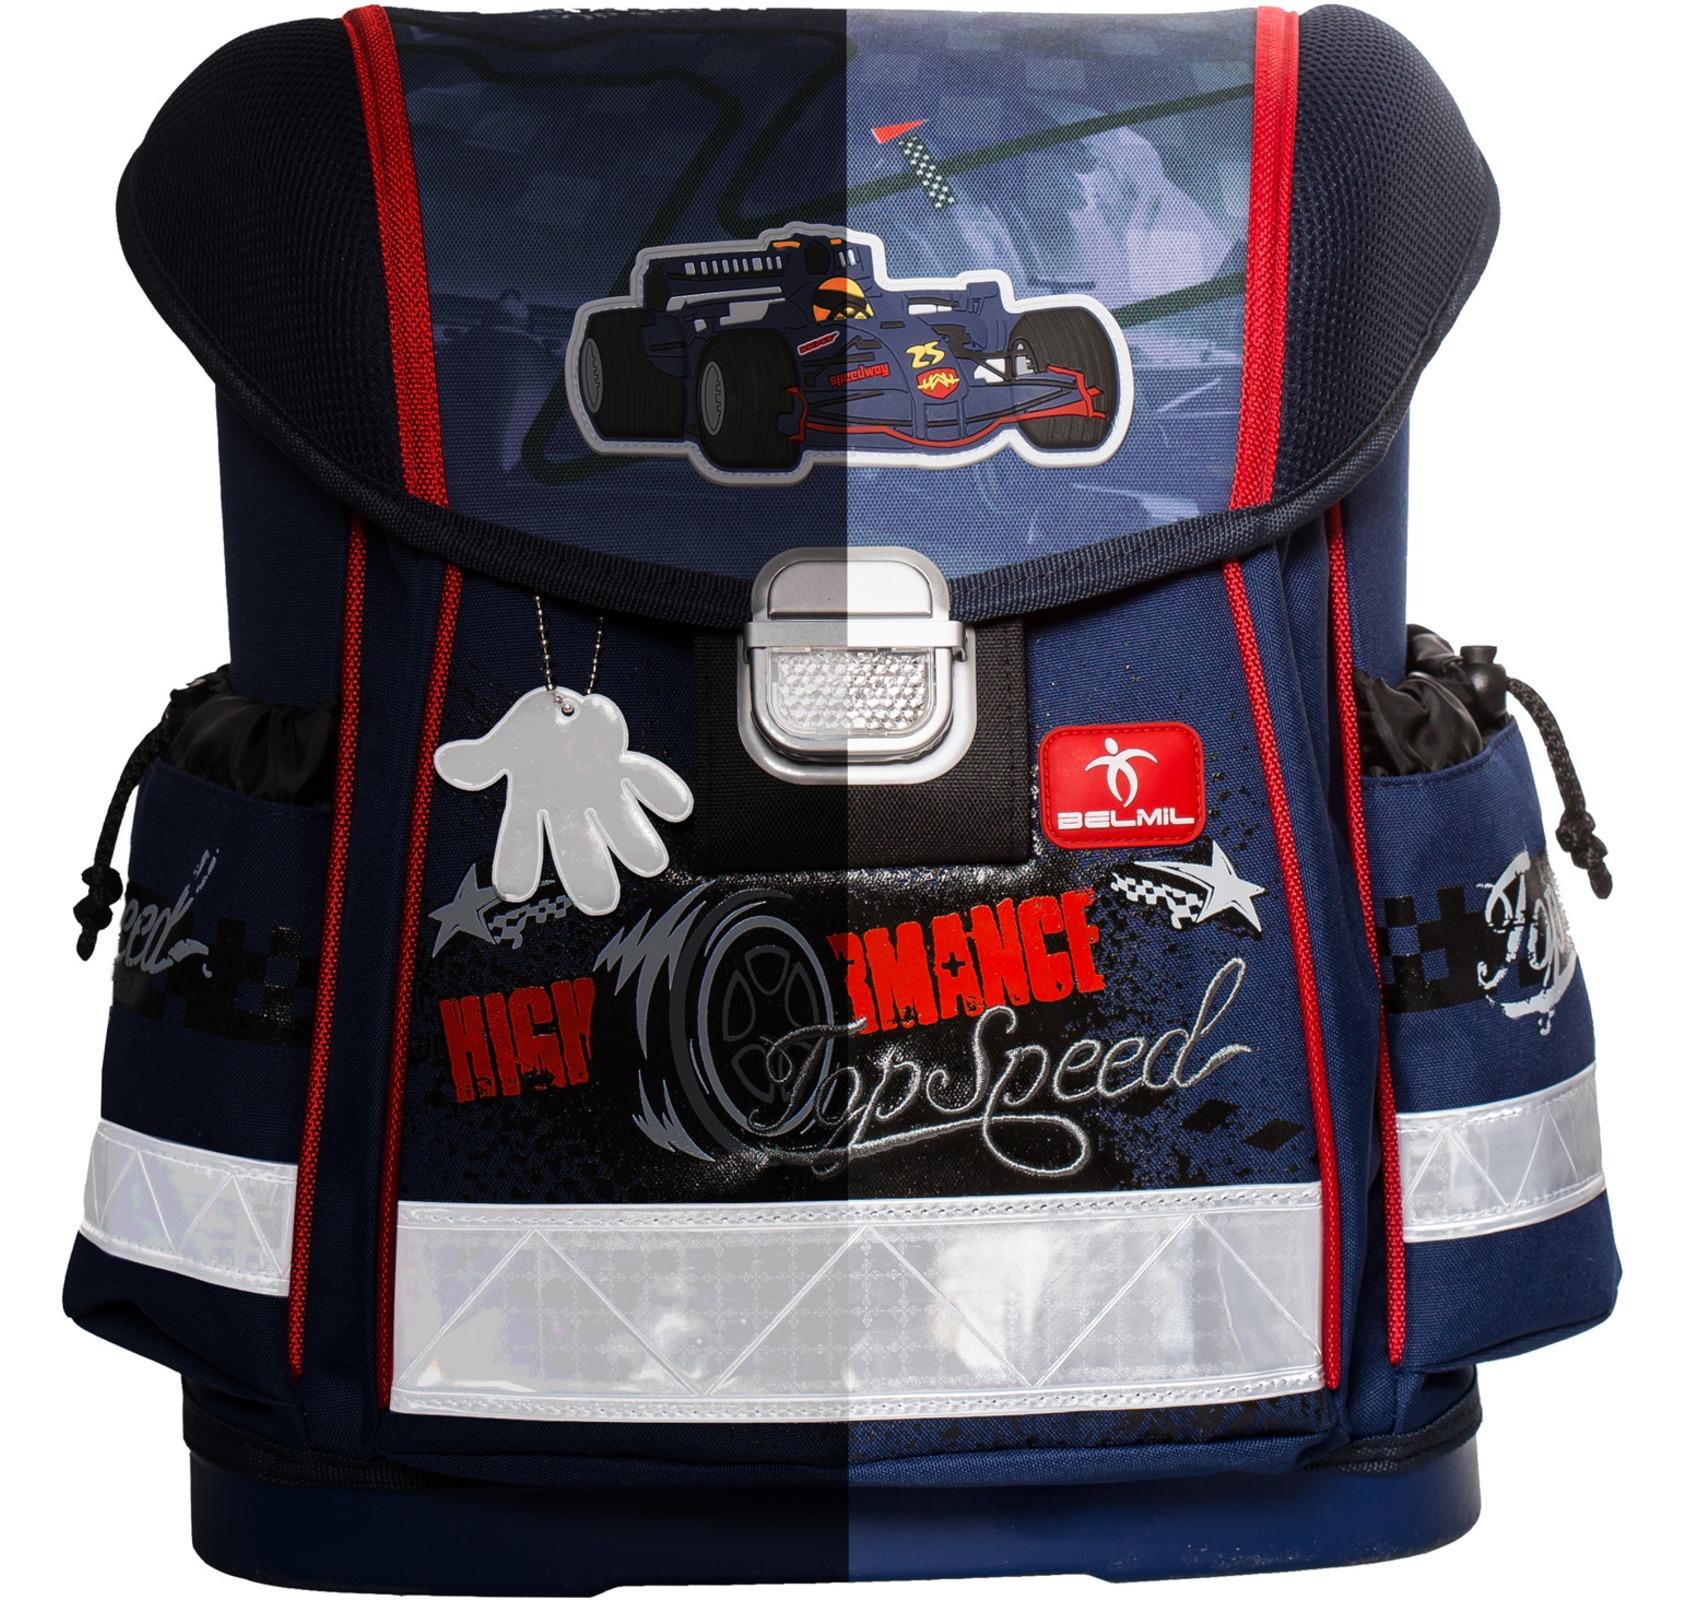 Ранец Belmil 403-13 ROYAL FOOTBALL + мешок, - фото 8